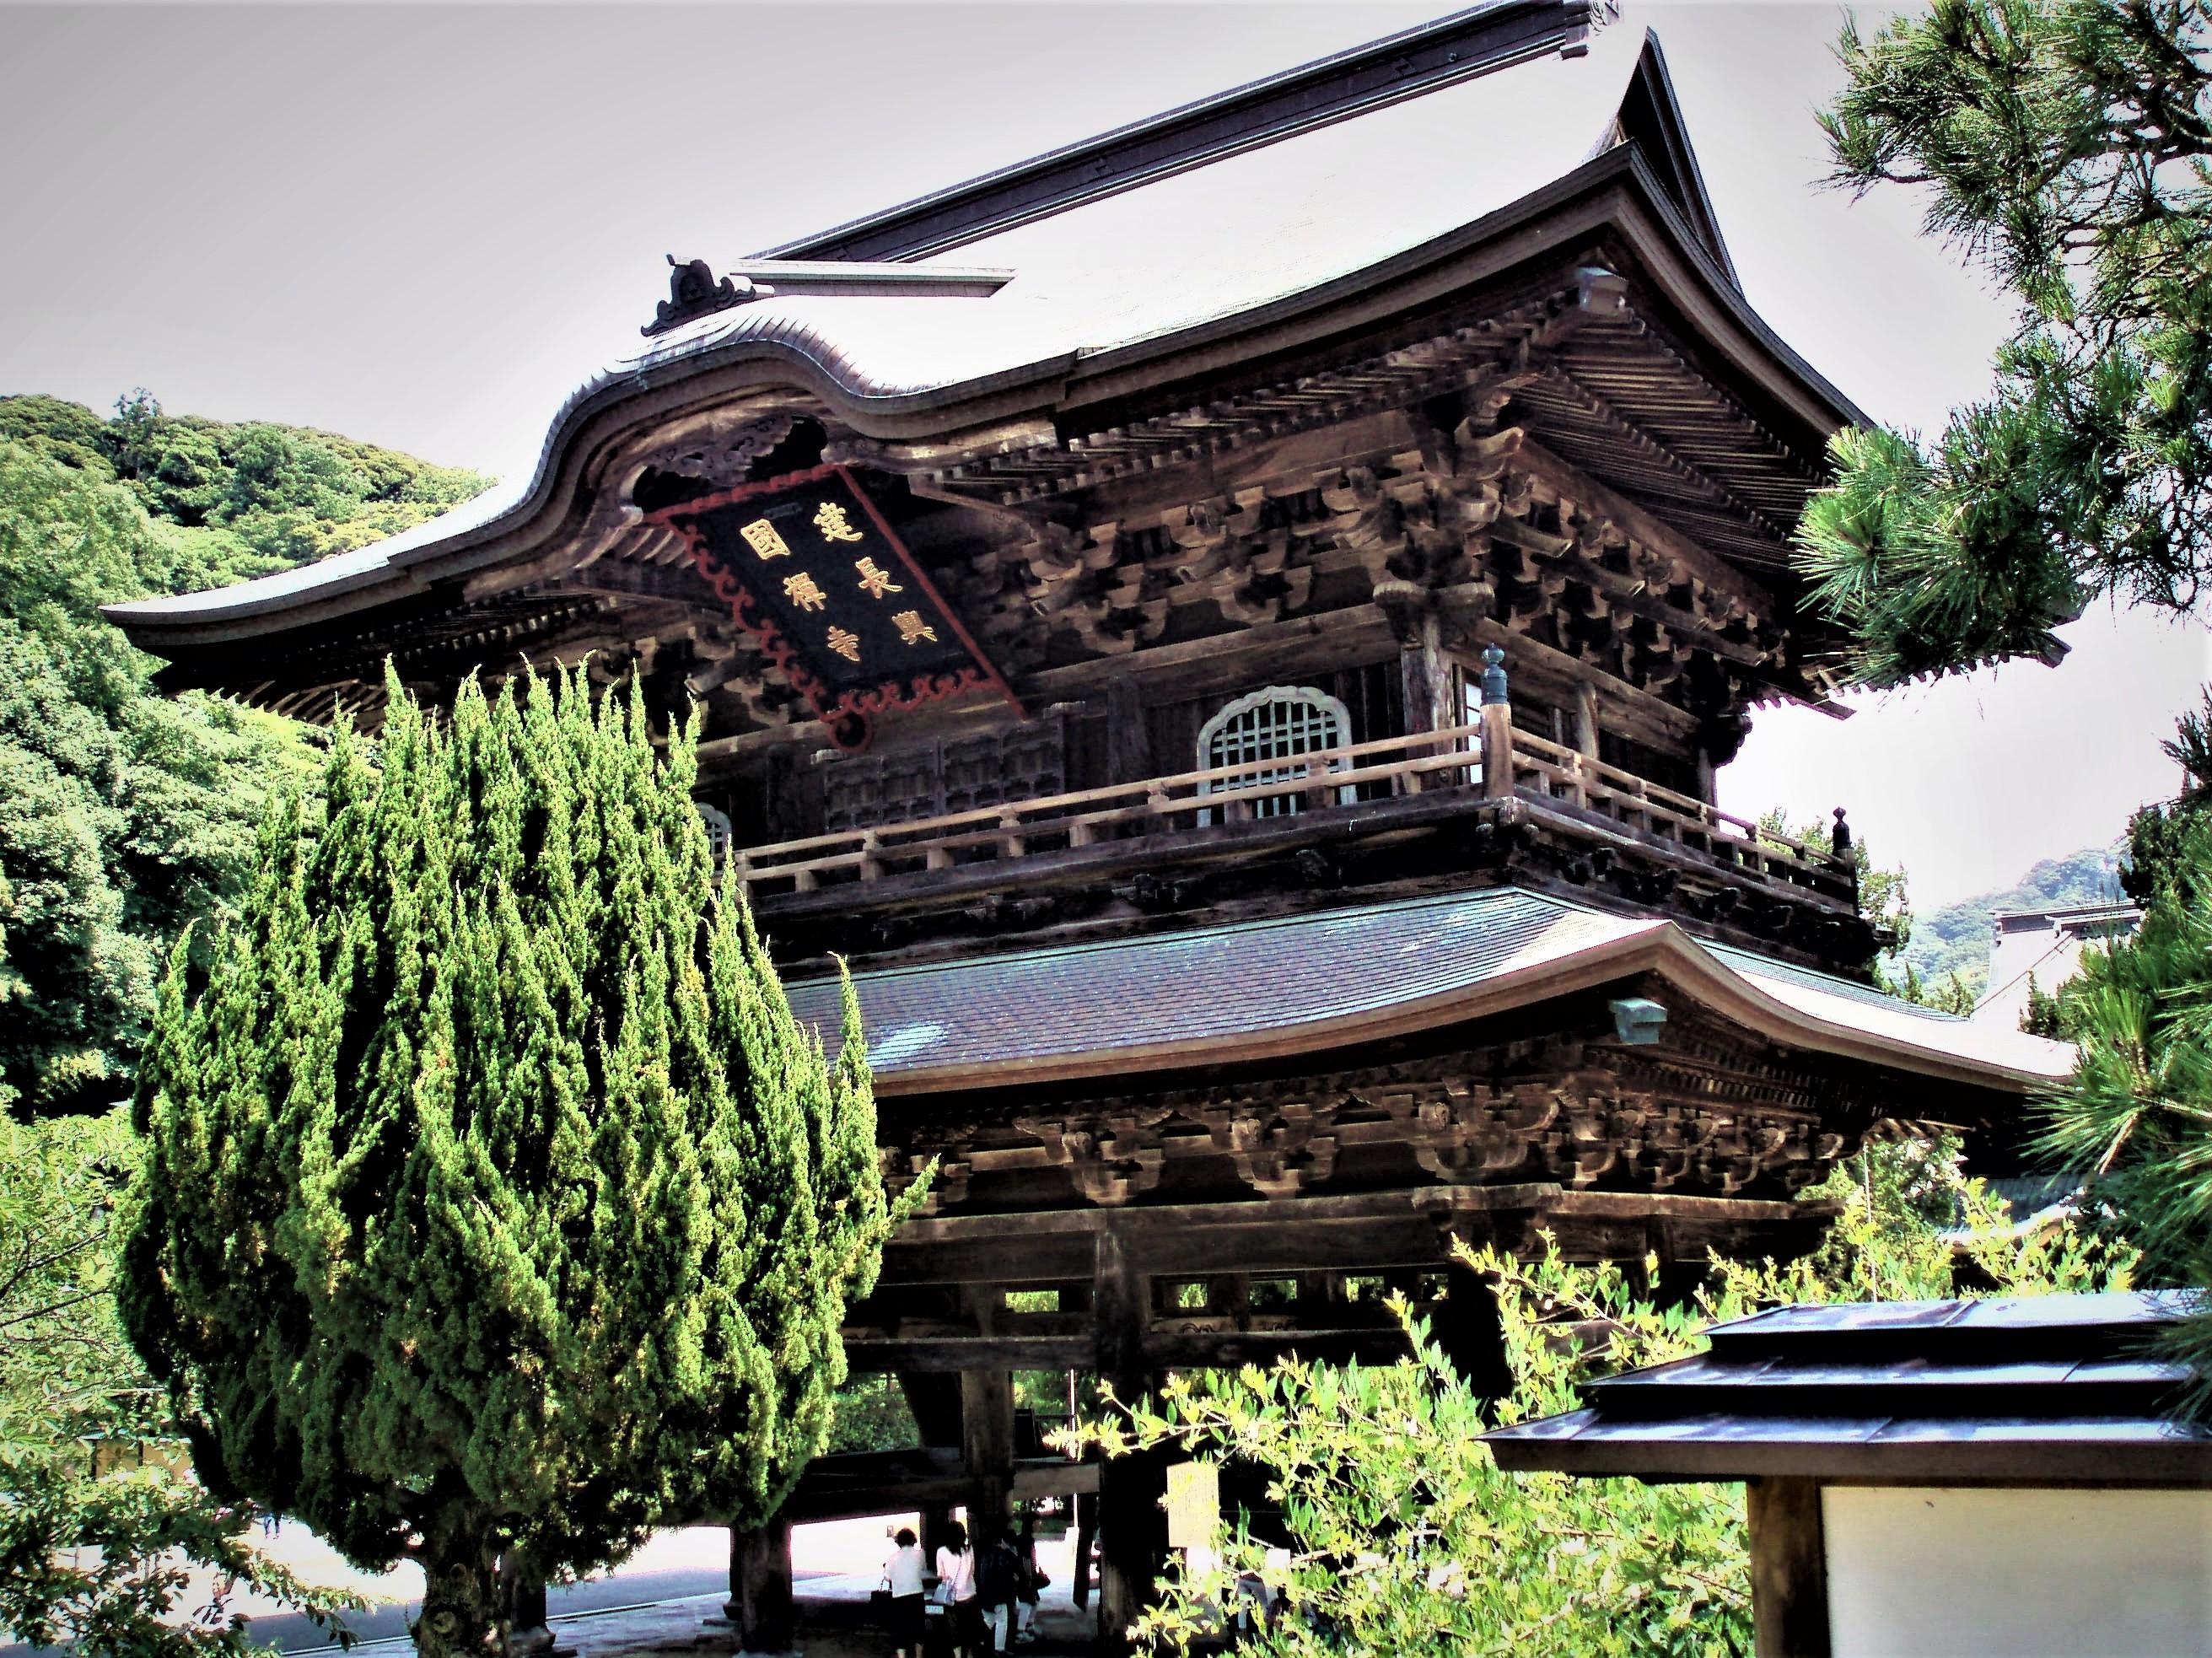 Kenchoji temple